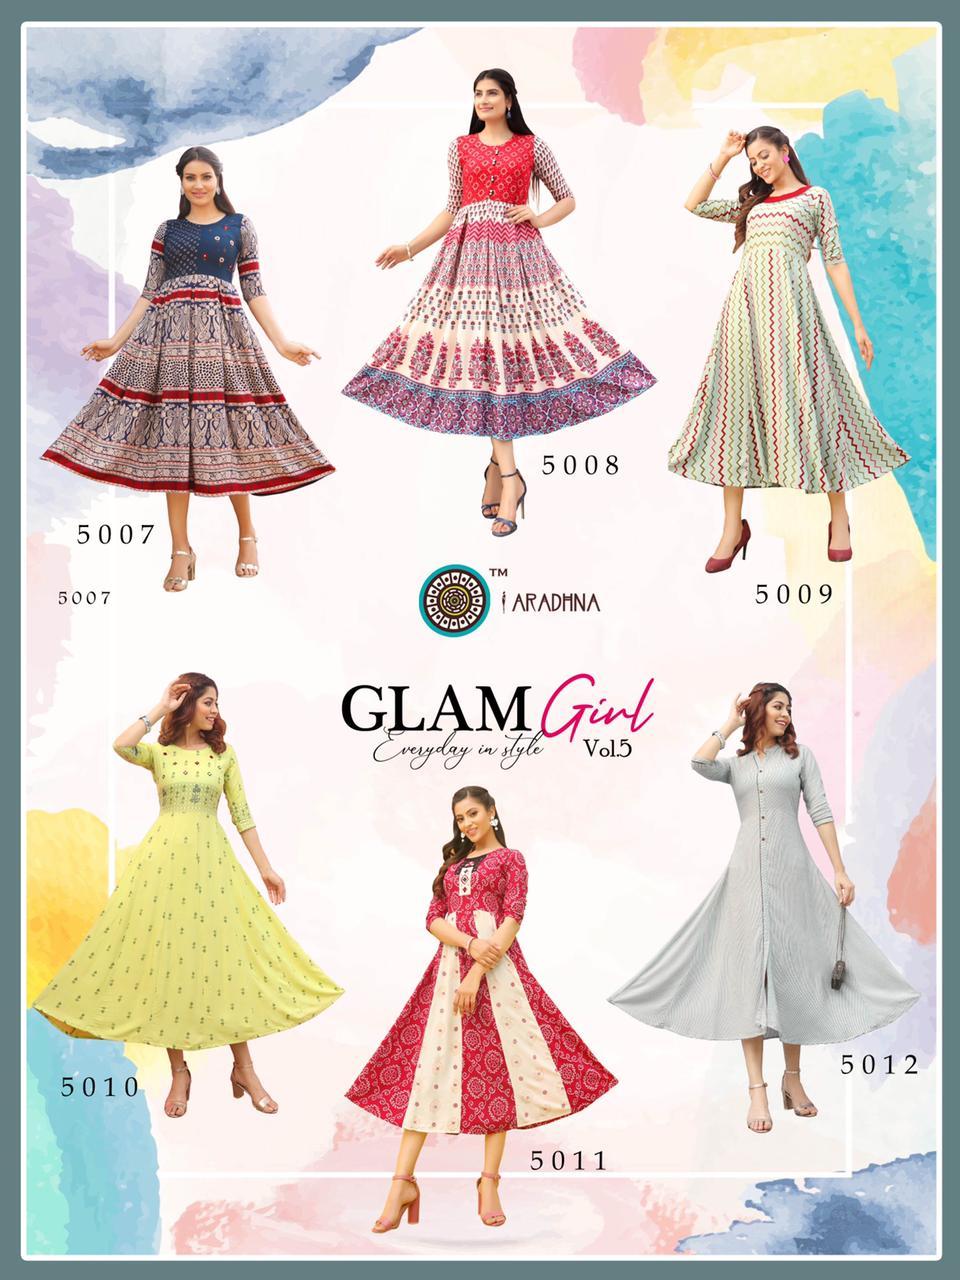 Aradhna Glam Girl Vol 5 Kurti Wholesale Catalog 12 Pcs 19 - Aradhna Glam Girl Vol 5 Kurti Wholesale Catalog 12 Pcs